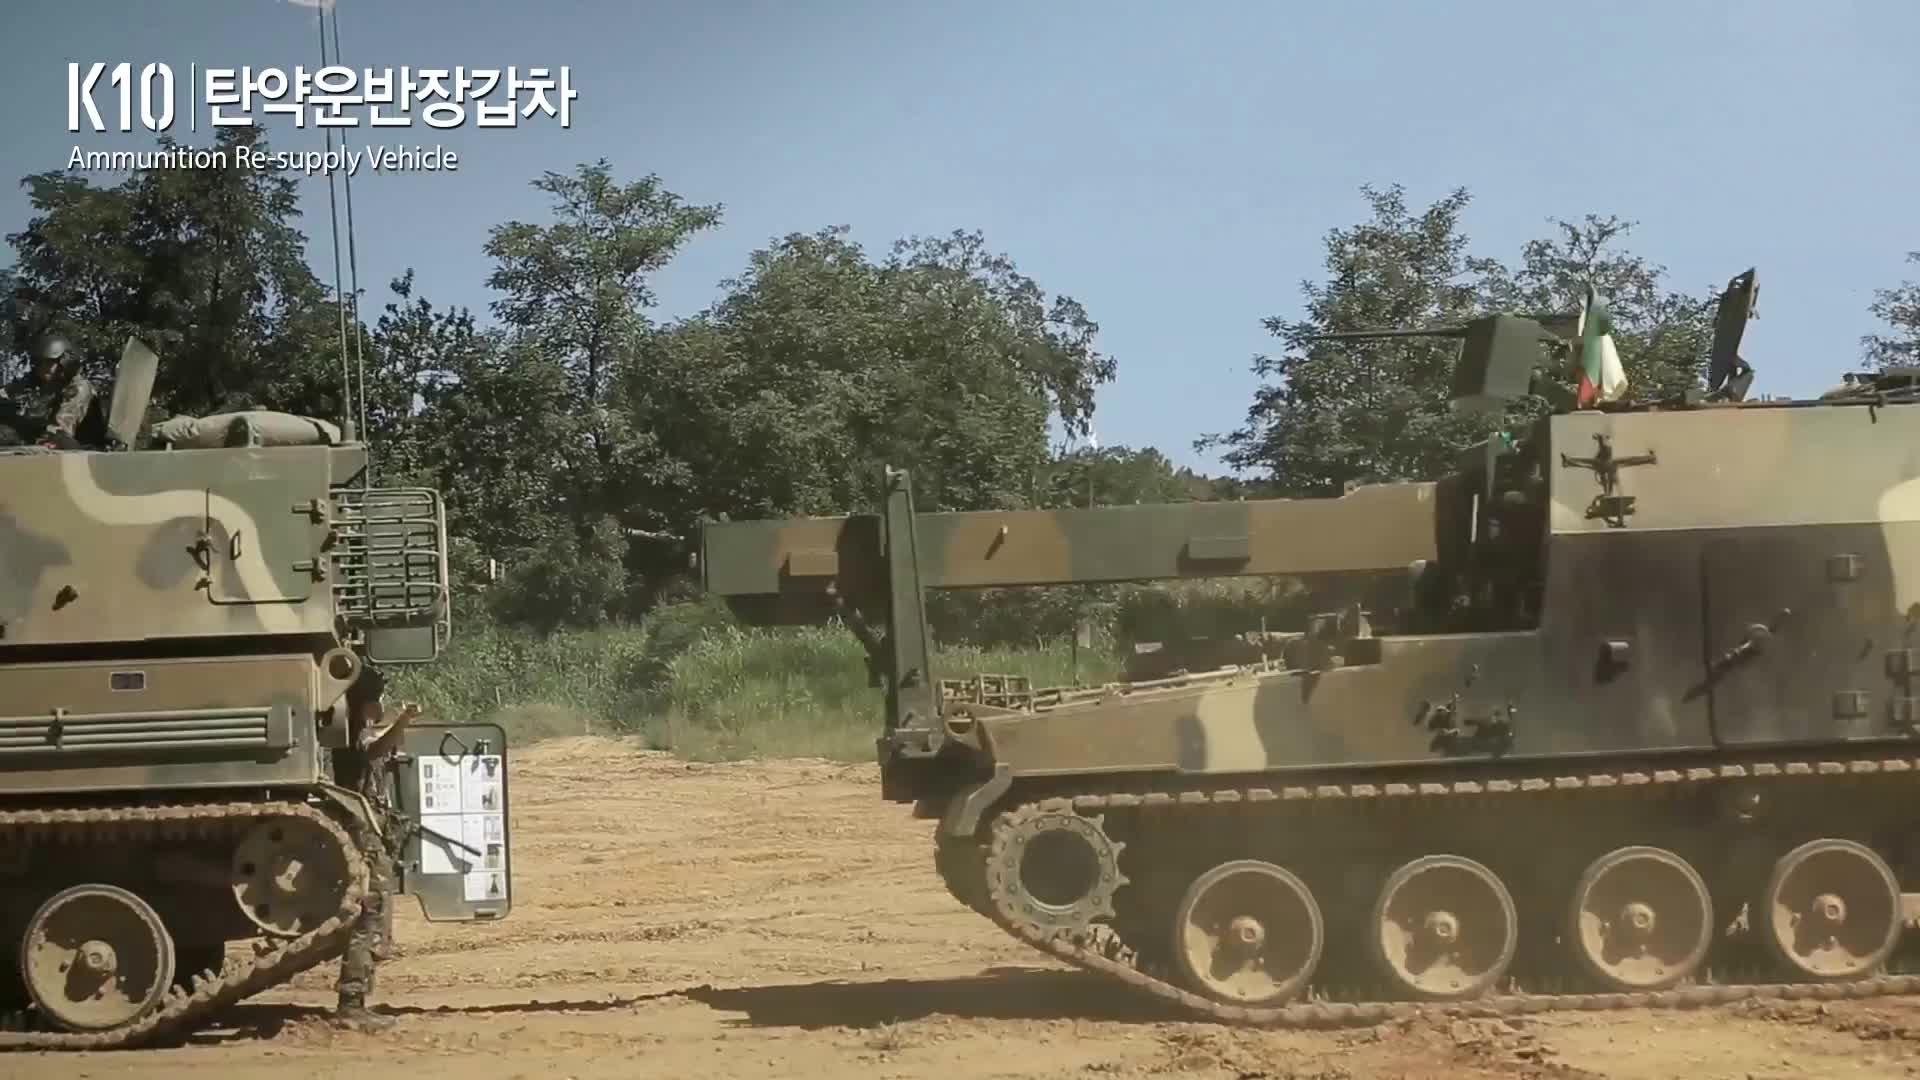 korea, military, militarygfys, south korea, K10 ammunition resupply vehicle GIFs